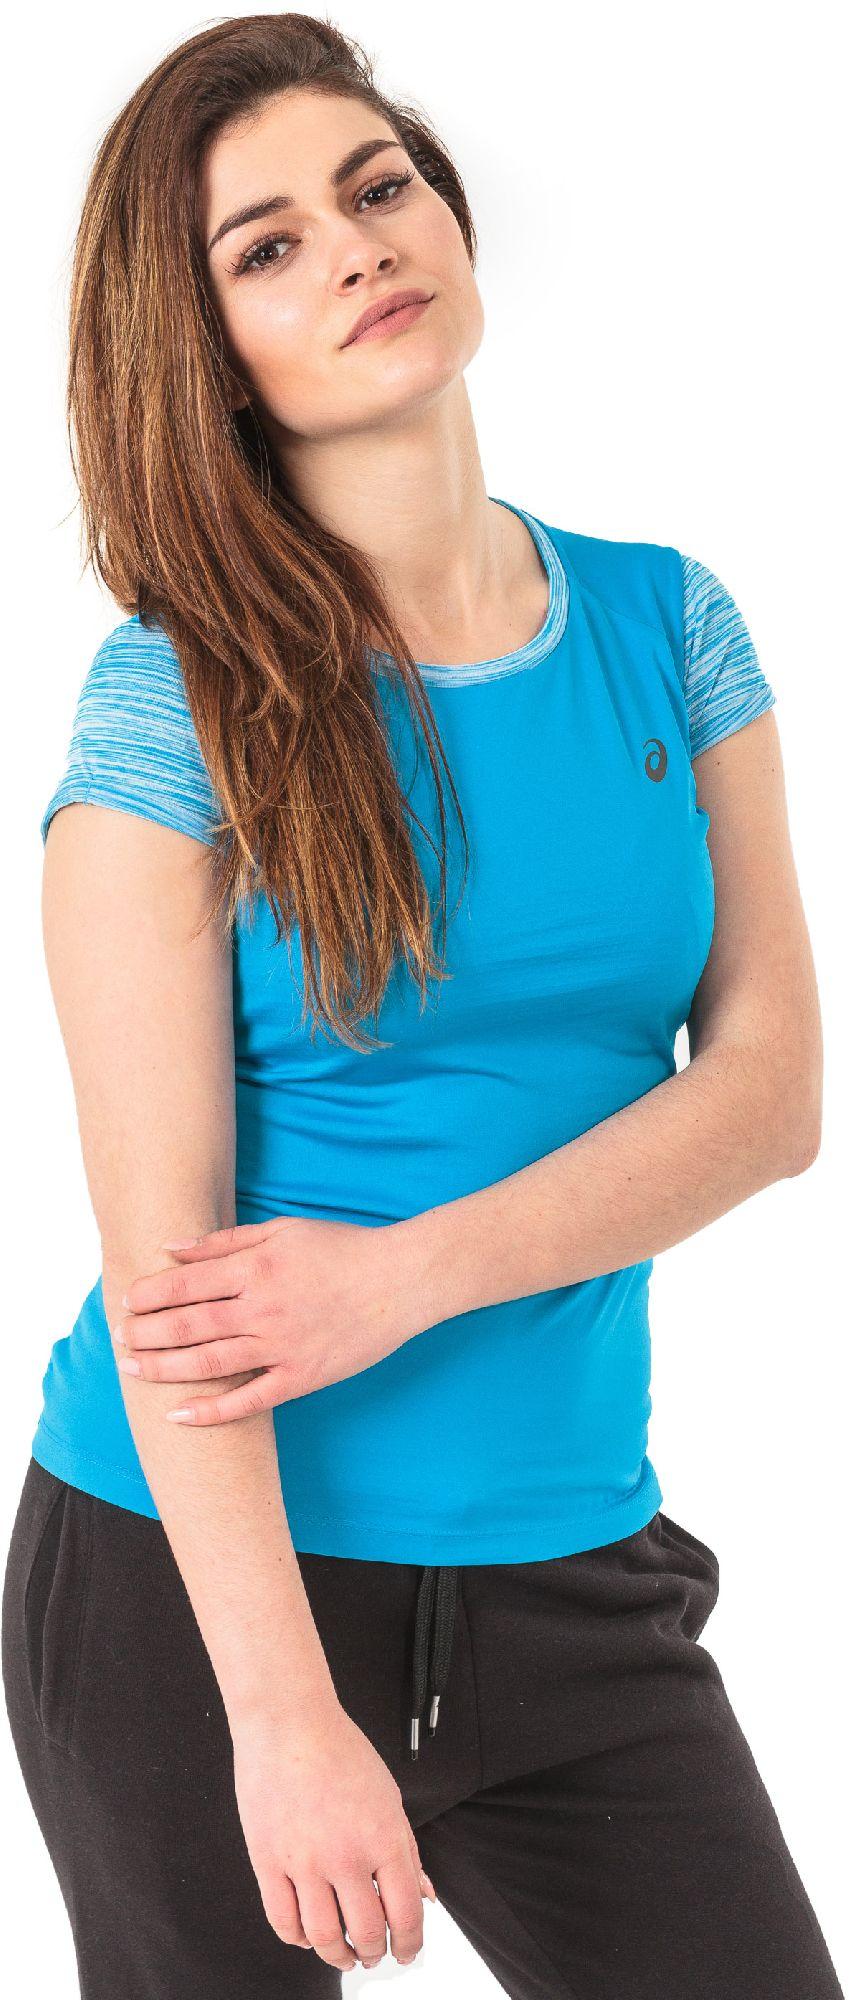 Asics Koszulka damska FuzeX Top Asics  niebieska r. M (1412558012) 1412558012